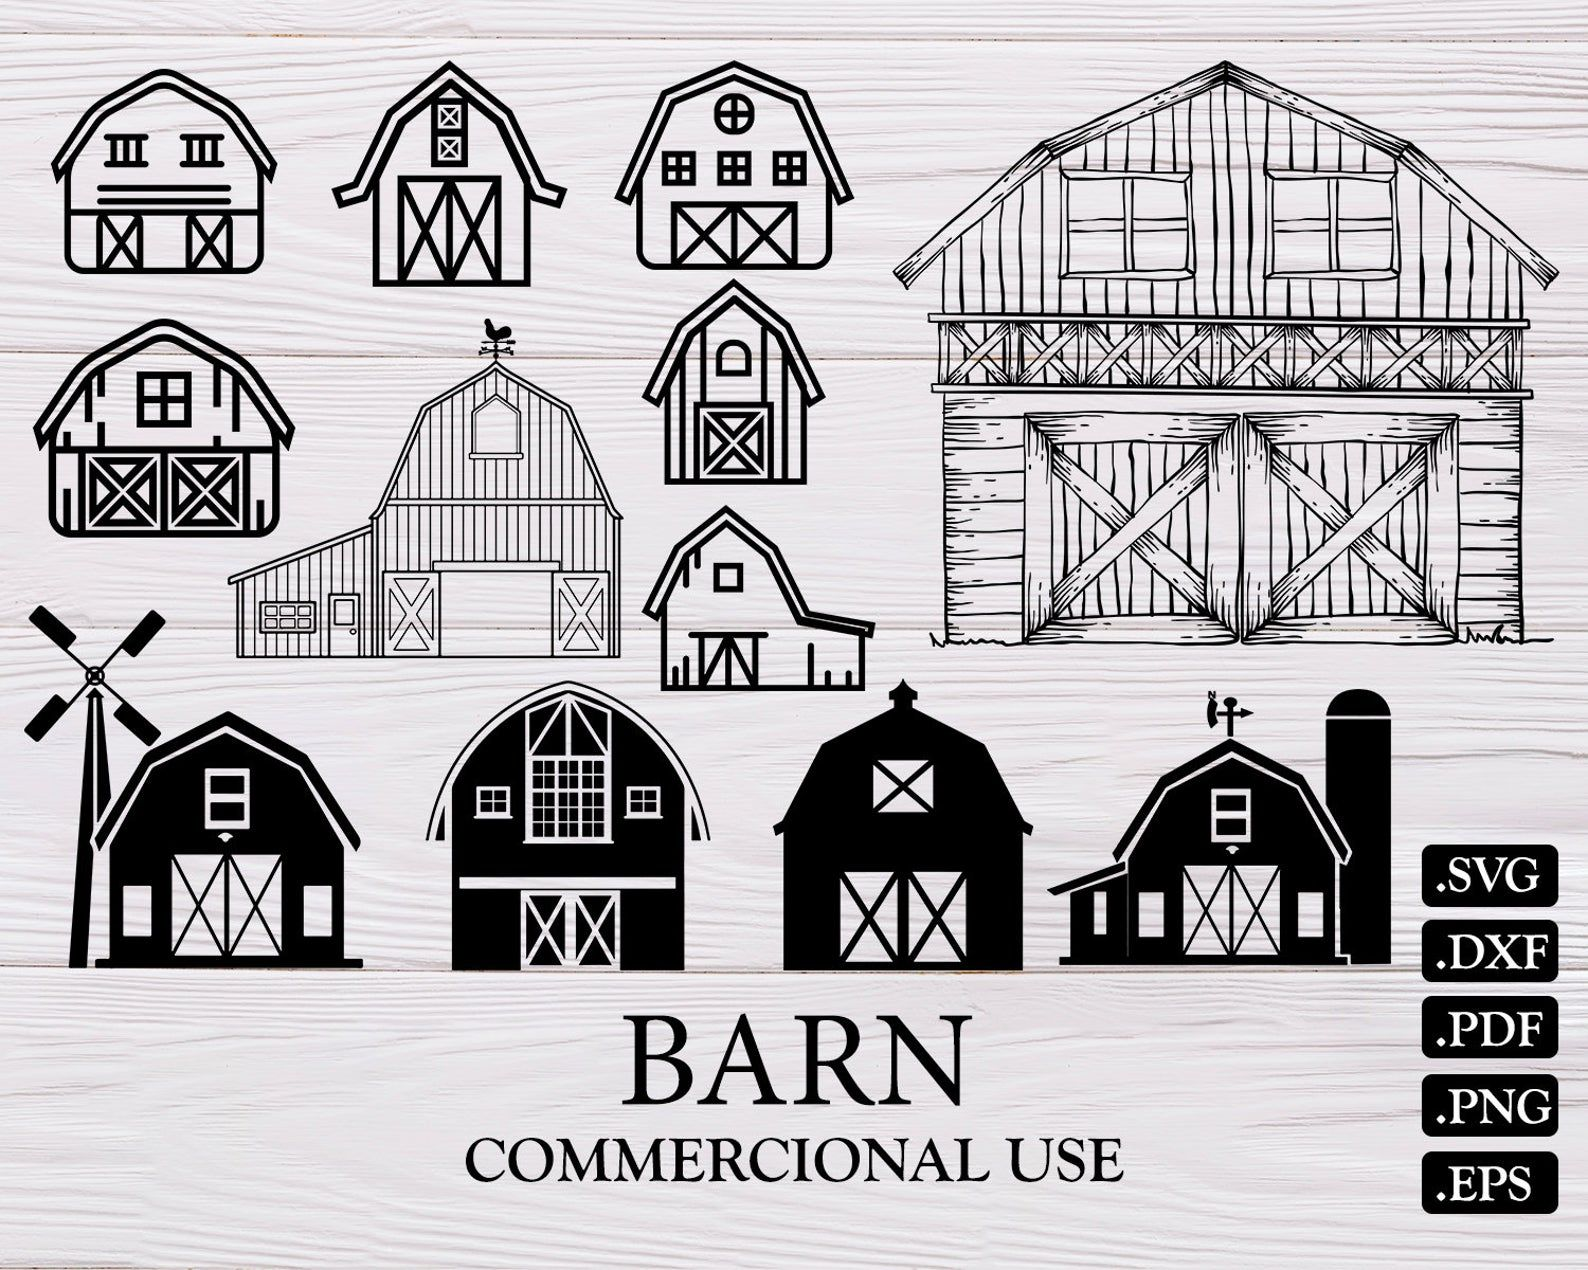 Barn Svg Farm Svg Barn Farmhouse Svg Farming Svg Barn Etsy Farm Logo Design Farm Barn Farm Life